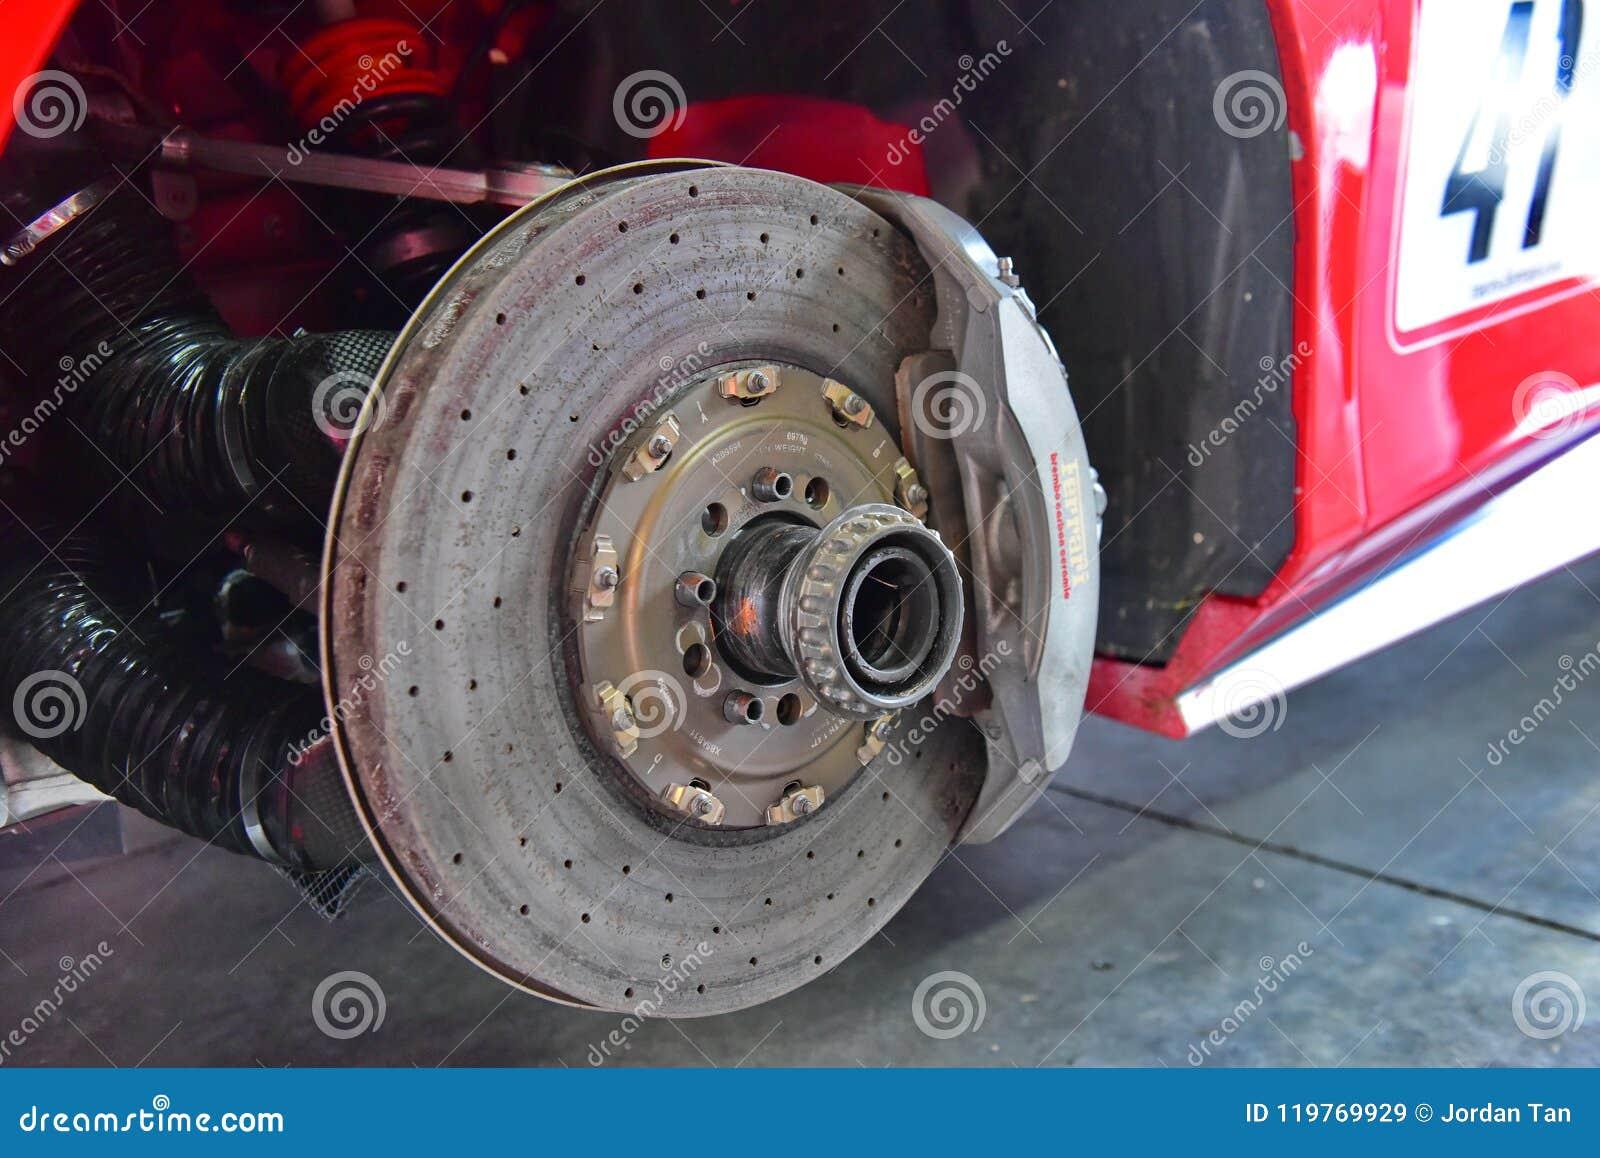 Carbon Ceramic Brake Disc Of A Ferrari 488 Challenge Car At Ferrari